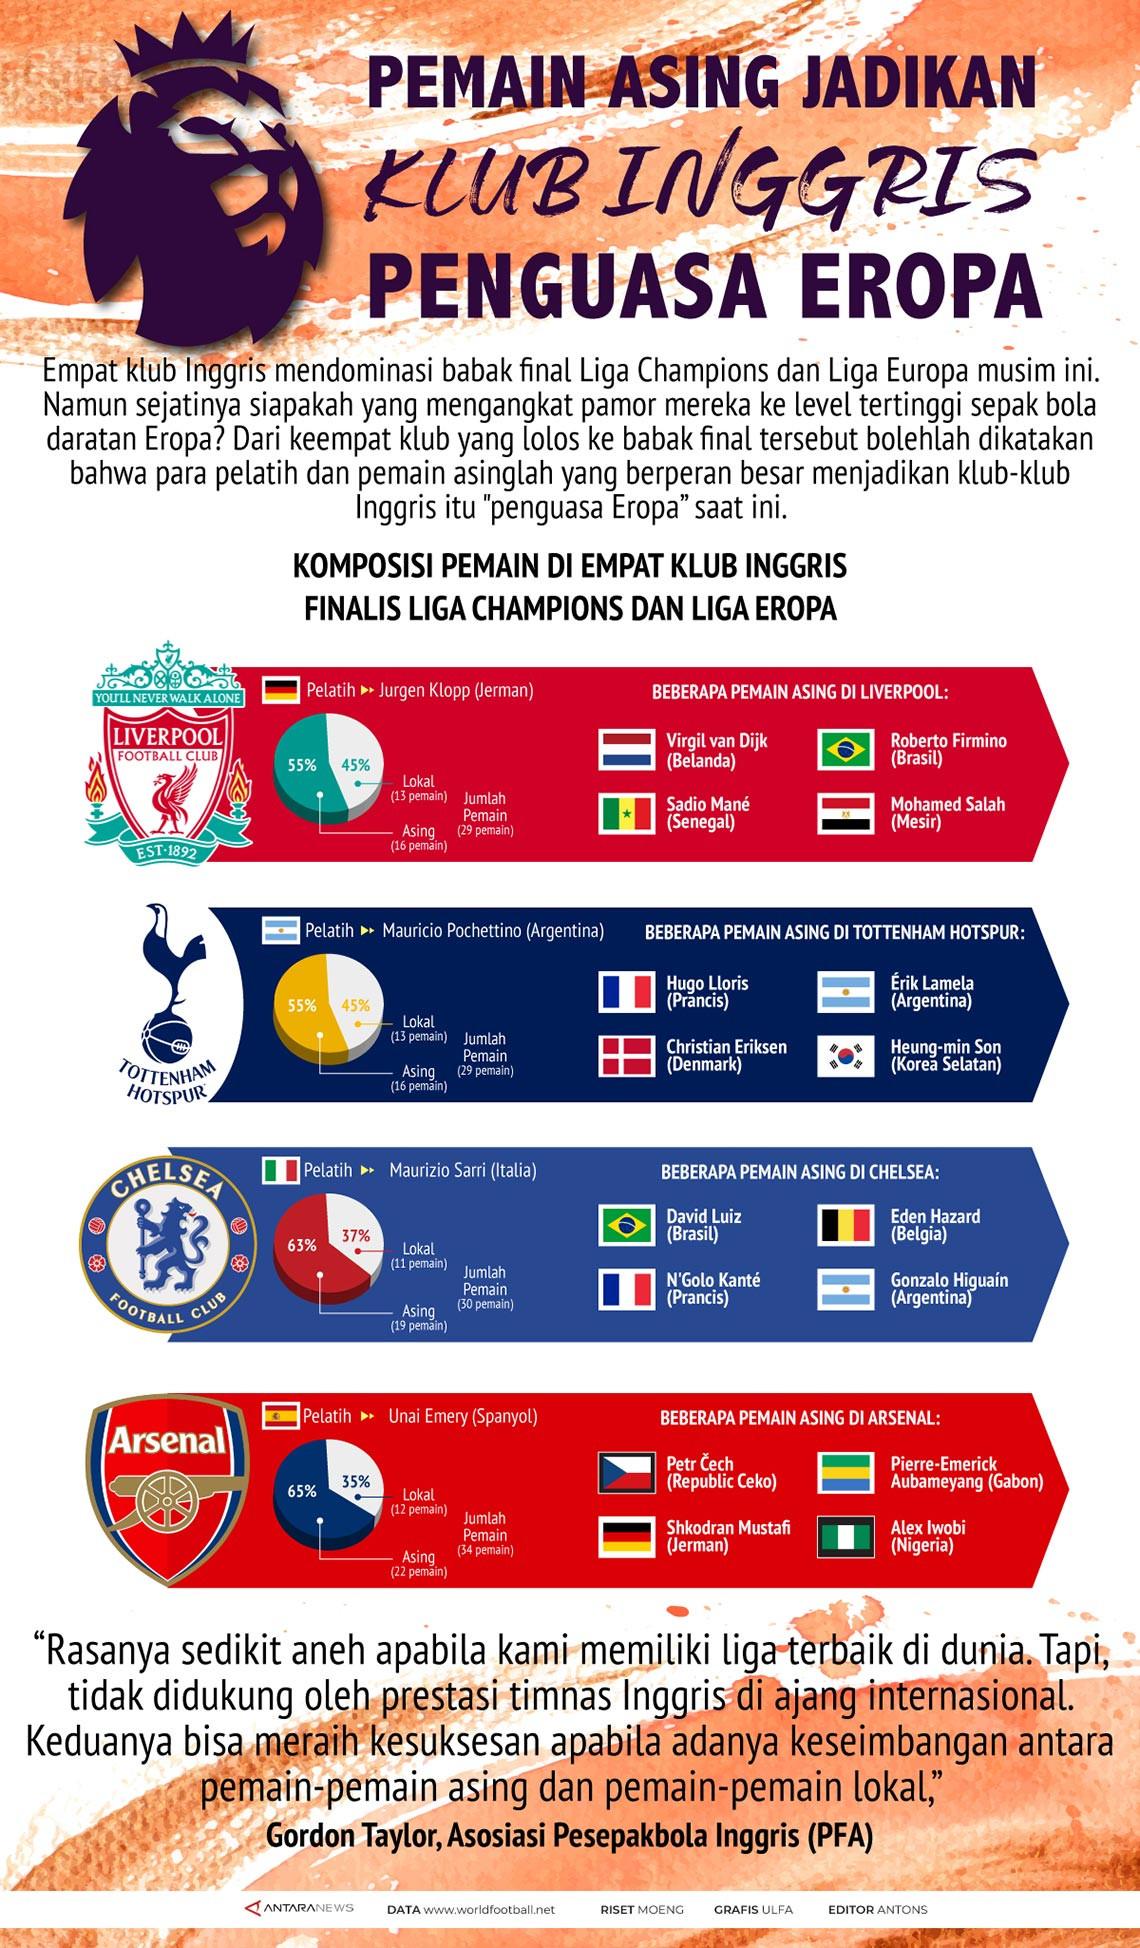 Pemain asing jadikan klub Inggris penguasa Eropa